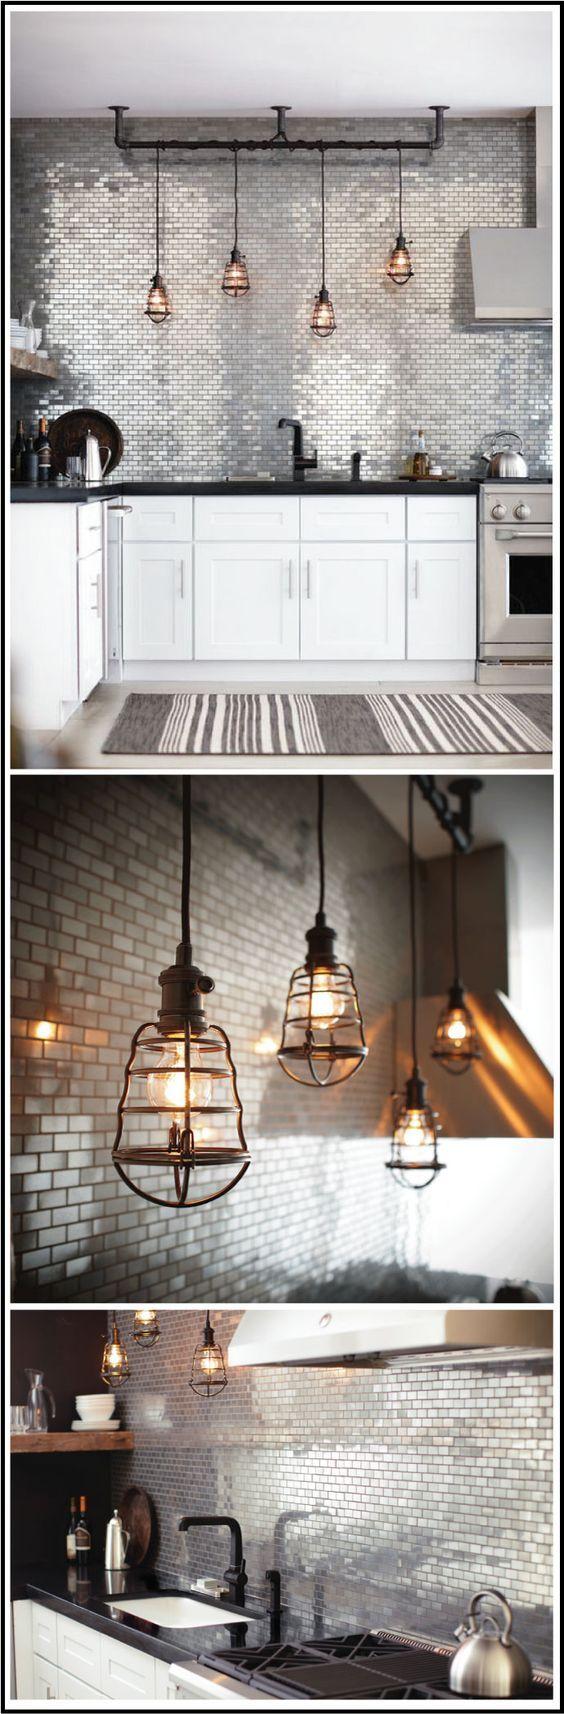 Industrial Style Kitchen Lighting 17 Best Ideas About Industrial Style Lighting On Pinterest